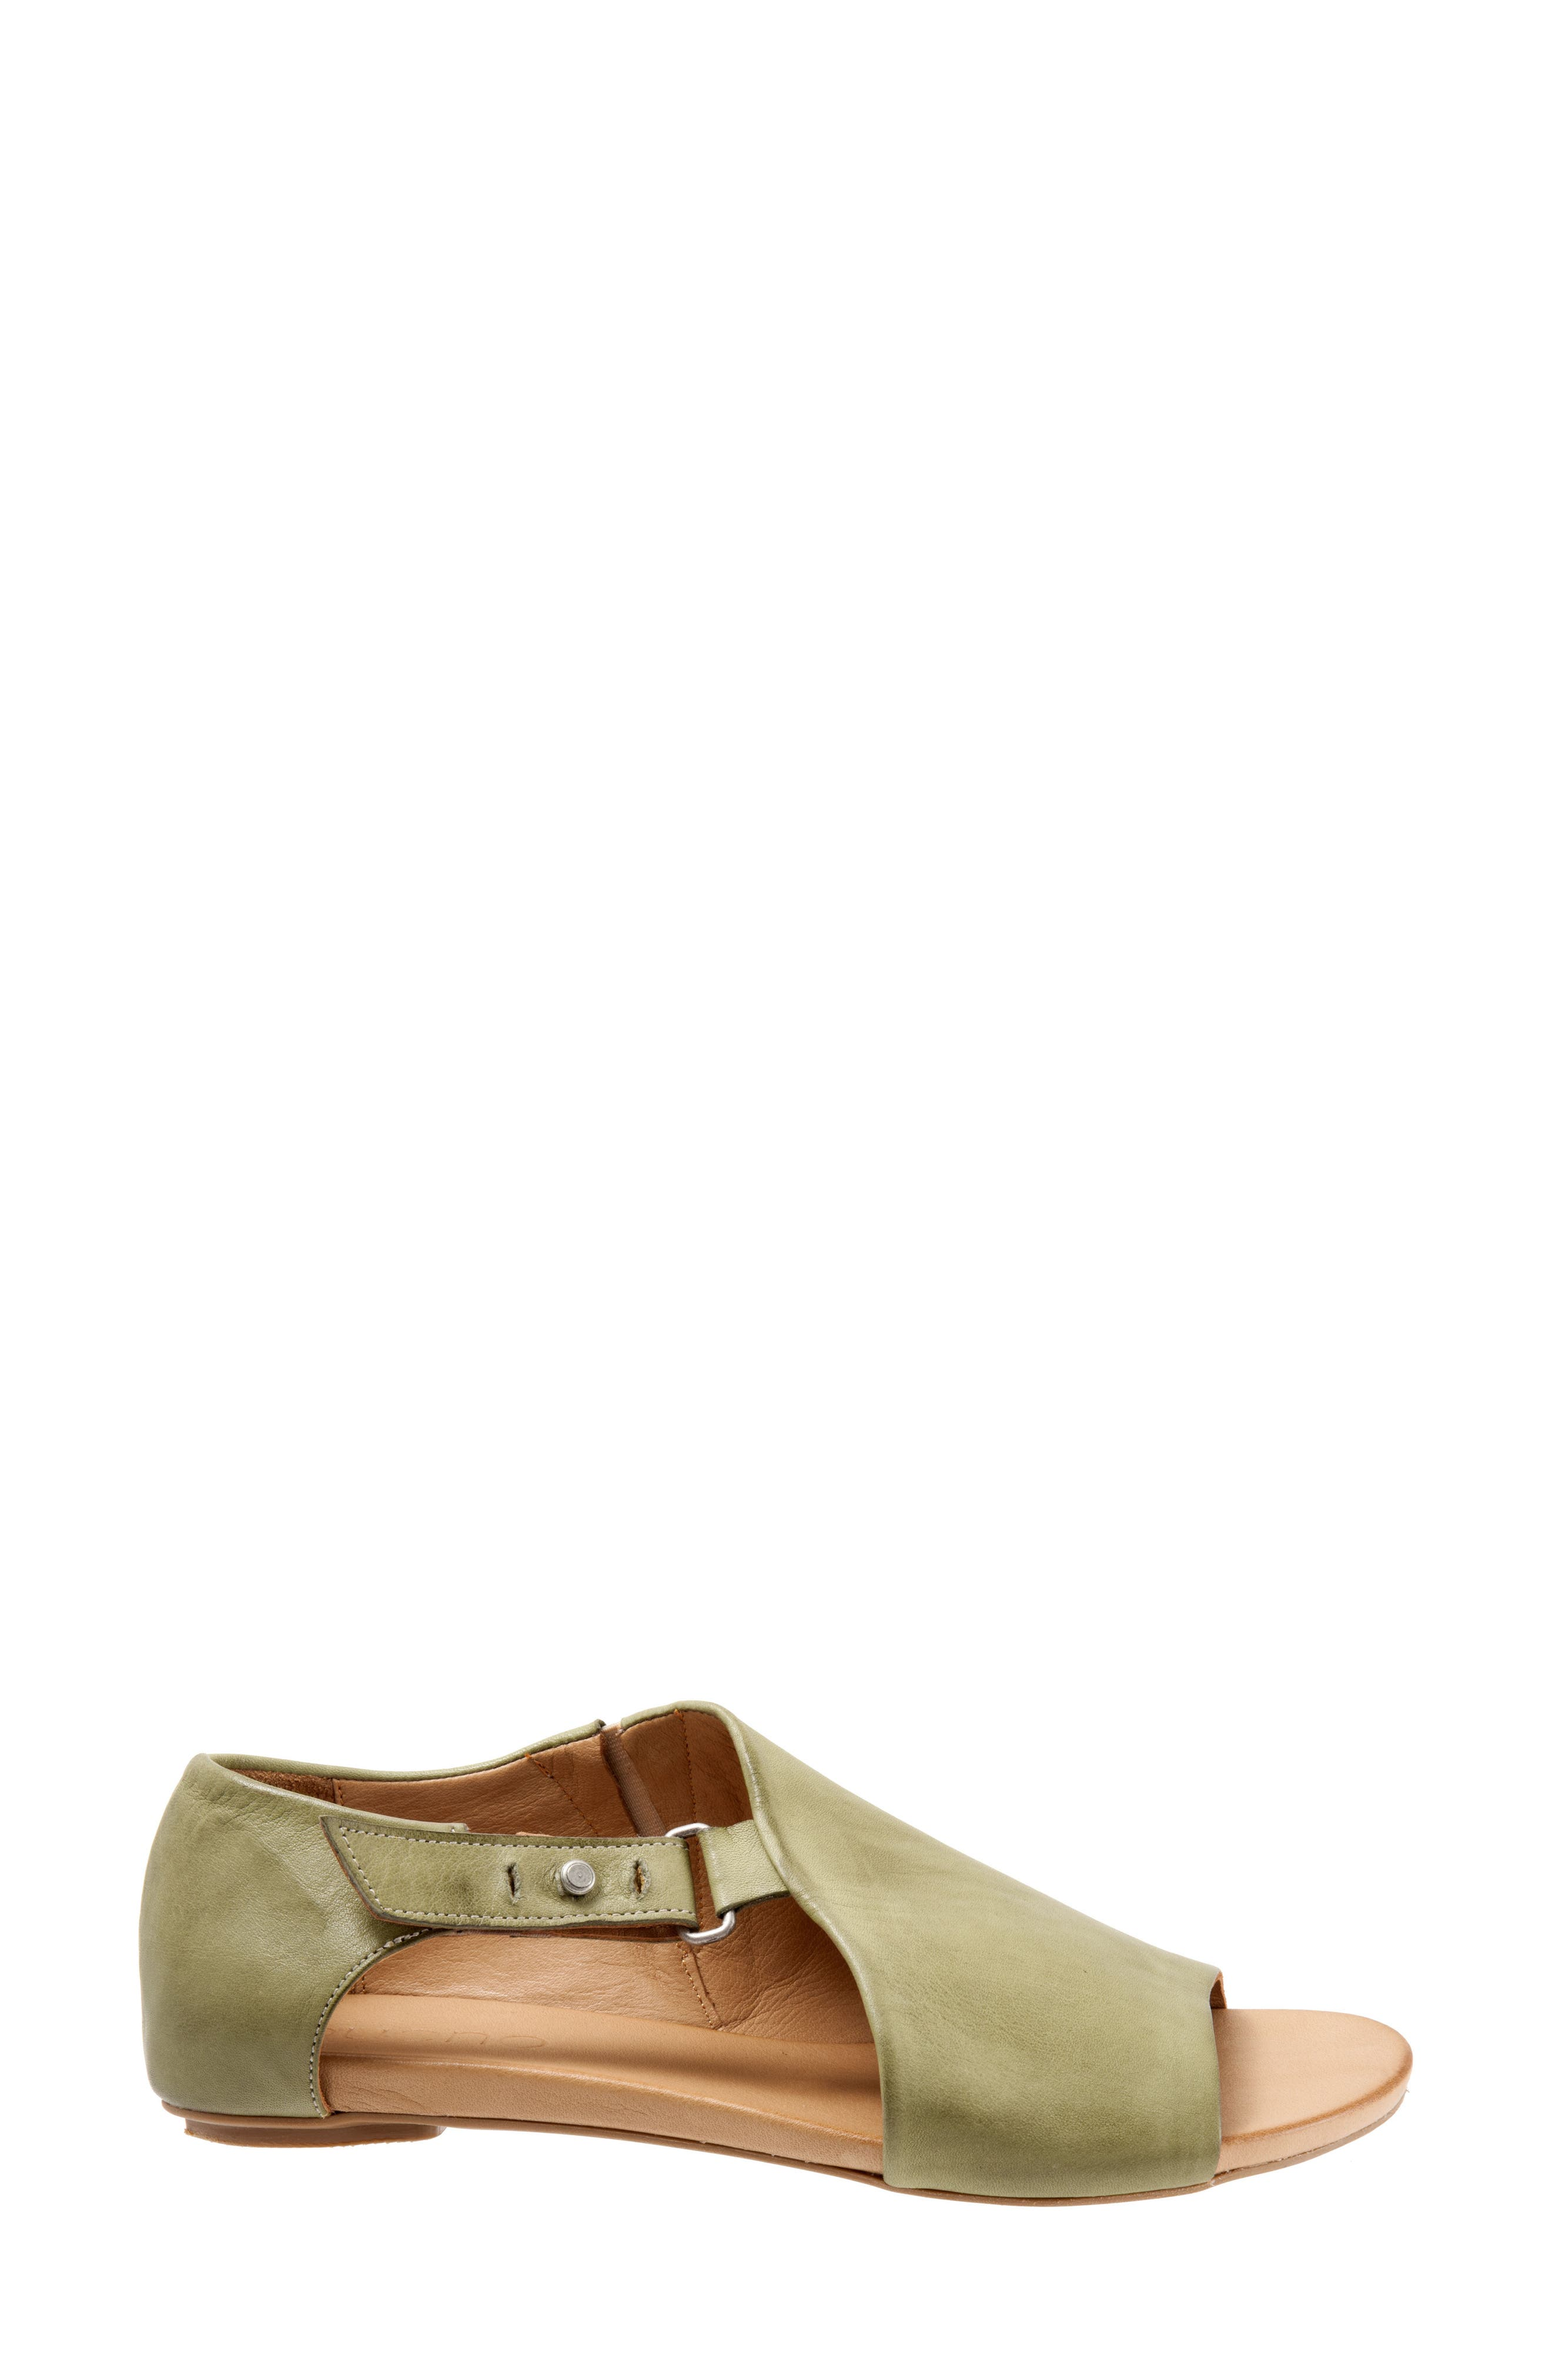 Kale Sandal,                             Alternate thumbnail 3, color,                             Moss Leather